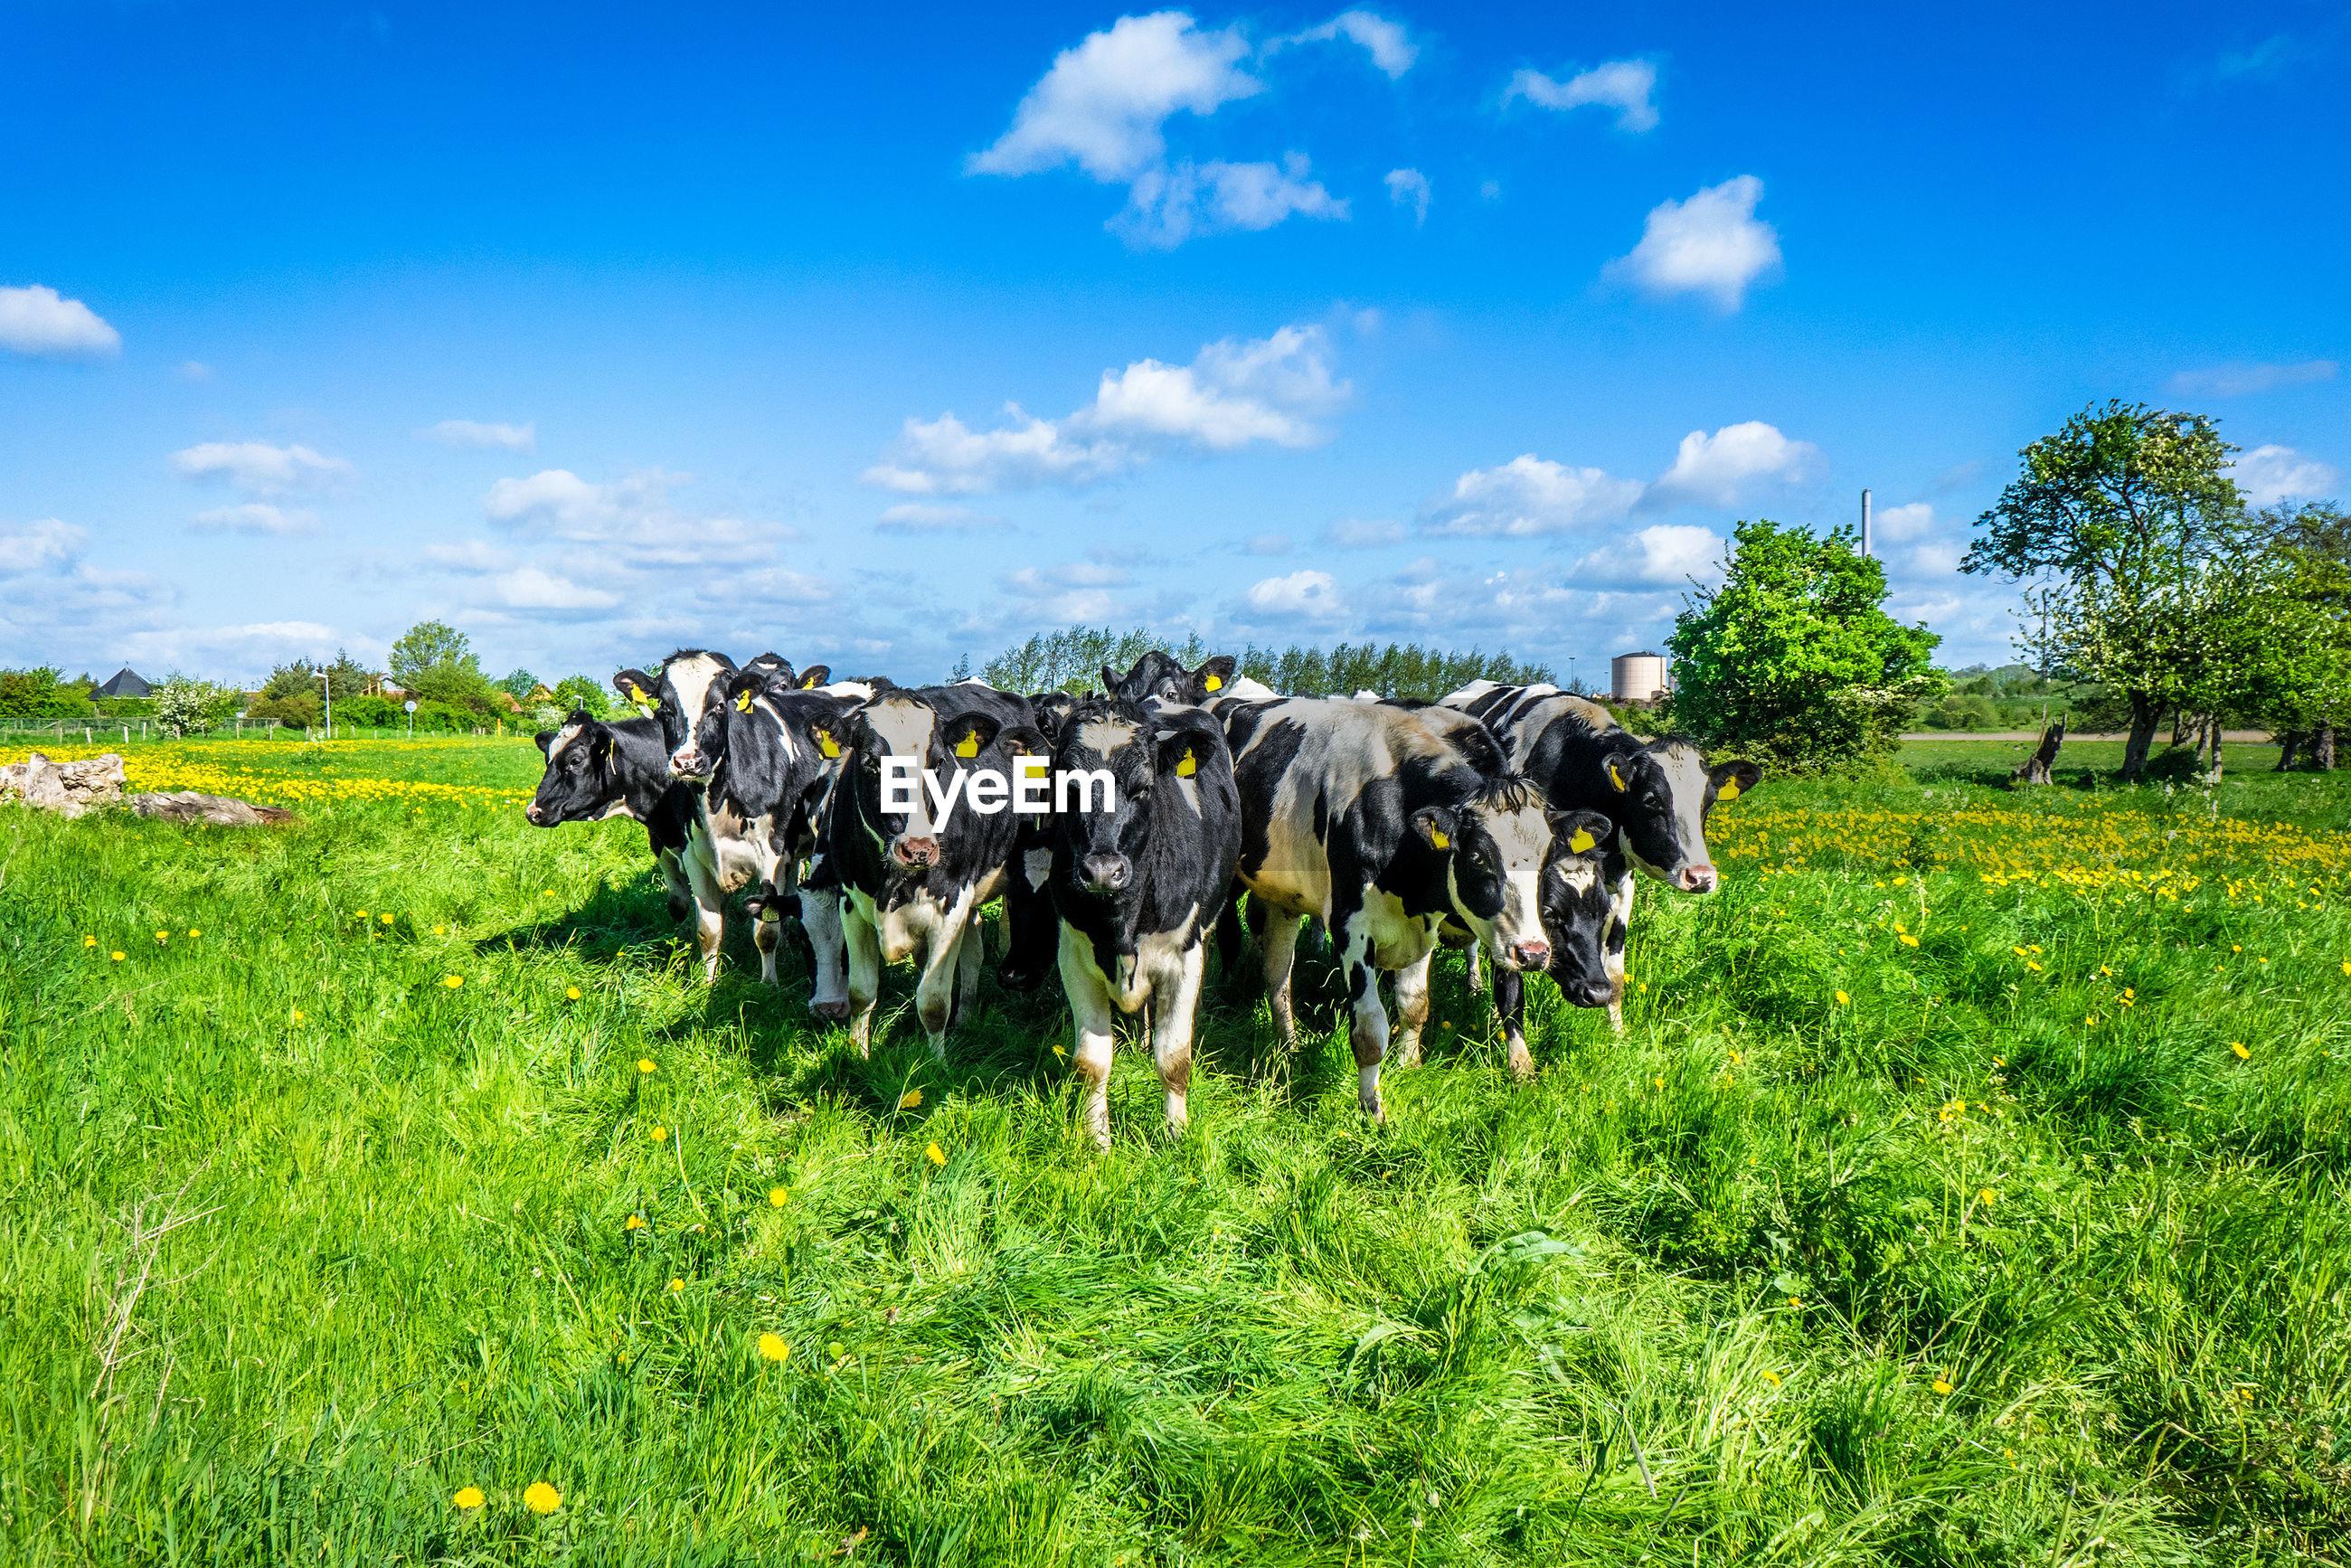 Herd of cows on grassy field against sky